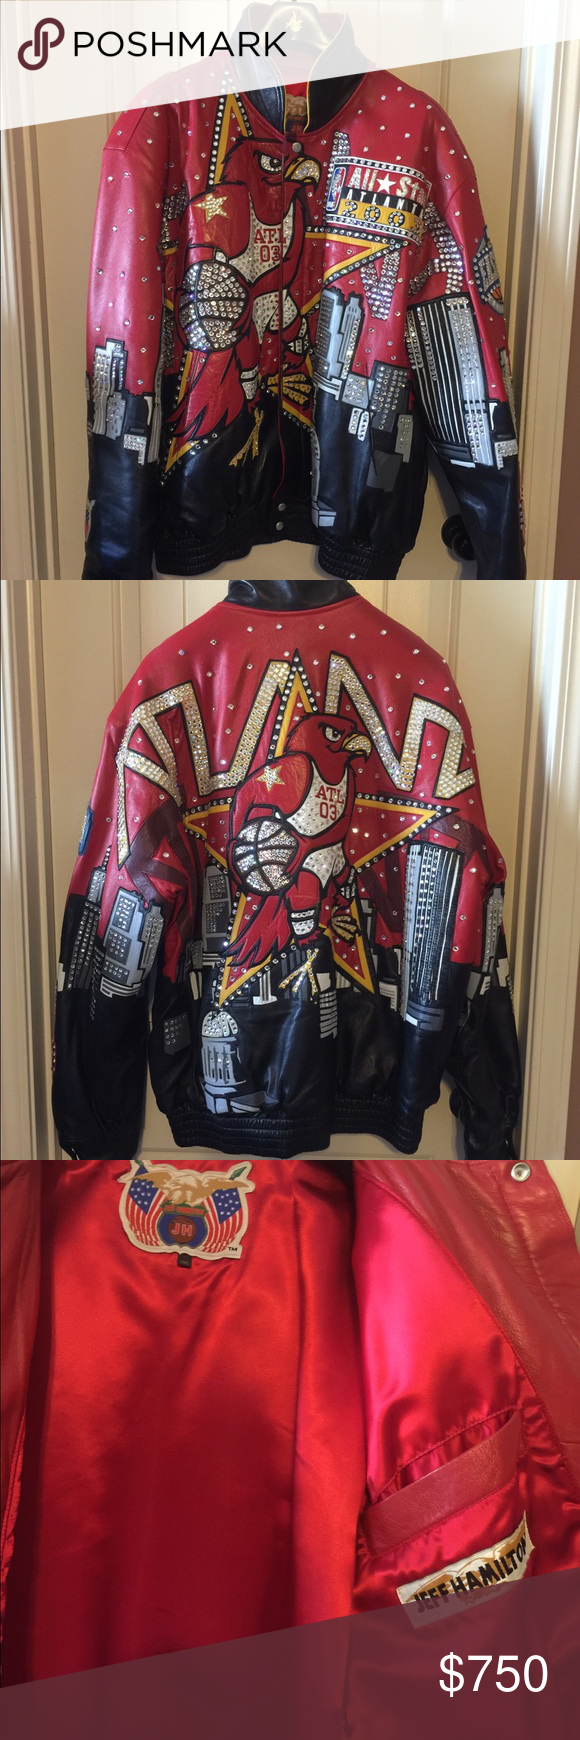 Vintage Chicago Bulls Nba Jordan Era Leather Jacket j.h. Jeff Hamilton Large Products Hot Sale